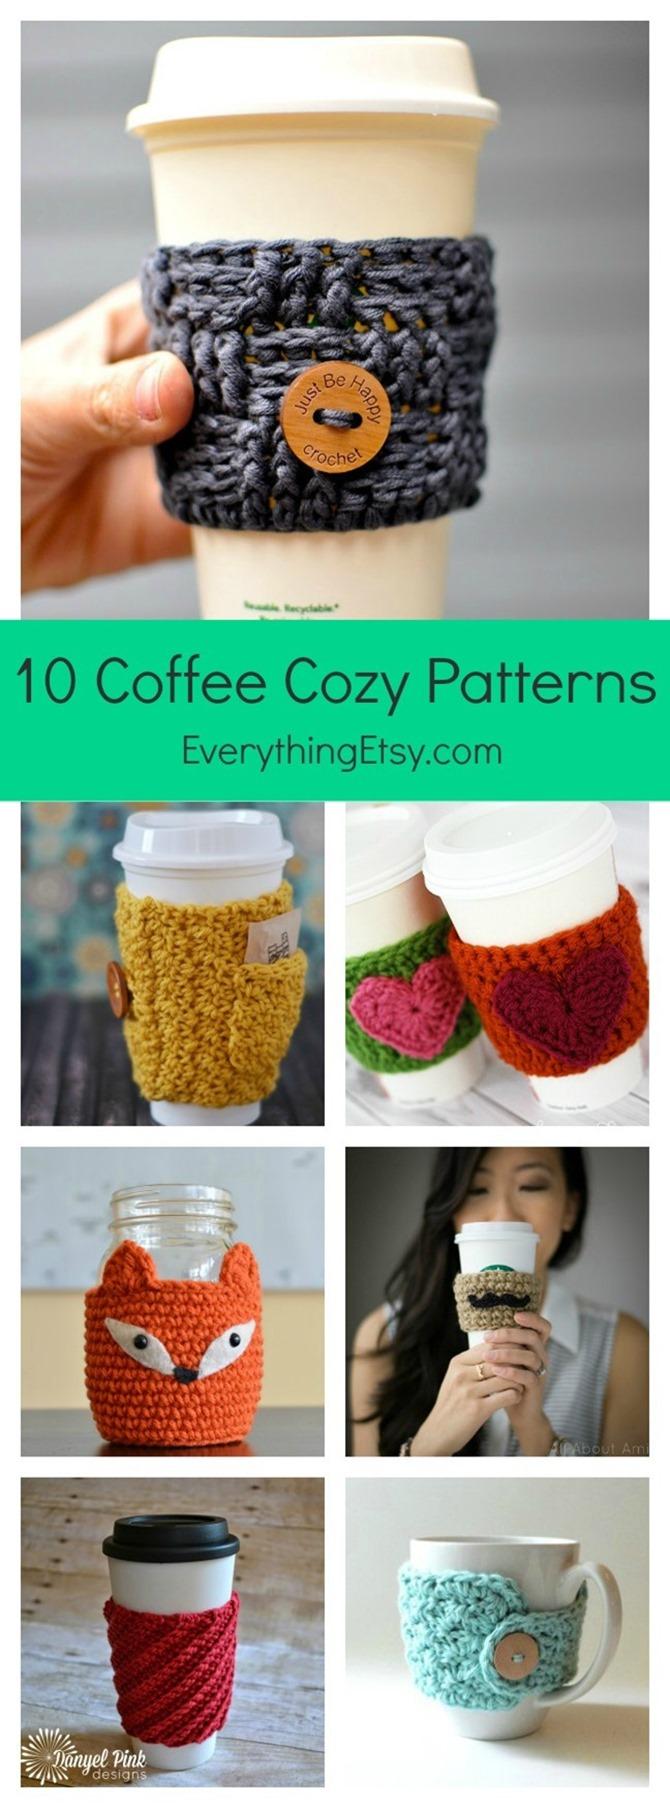 10-Free-Coffee-Cozy-Crochet-Patterns-on-EverythingEtsy.com_